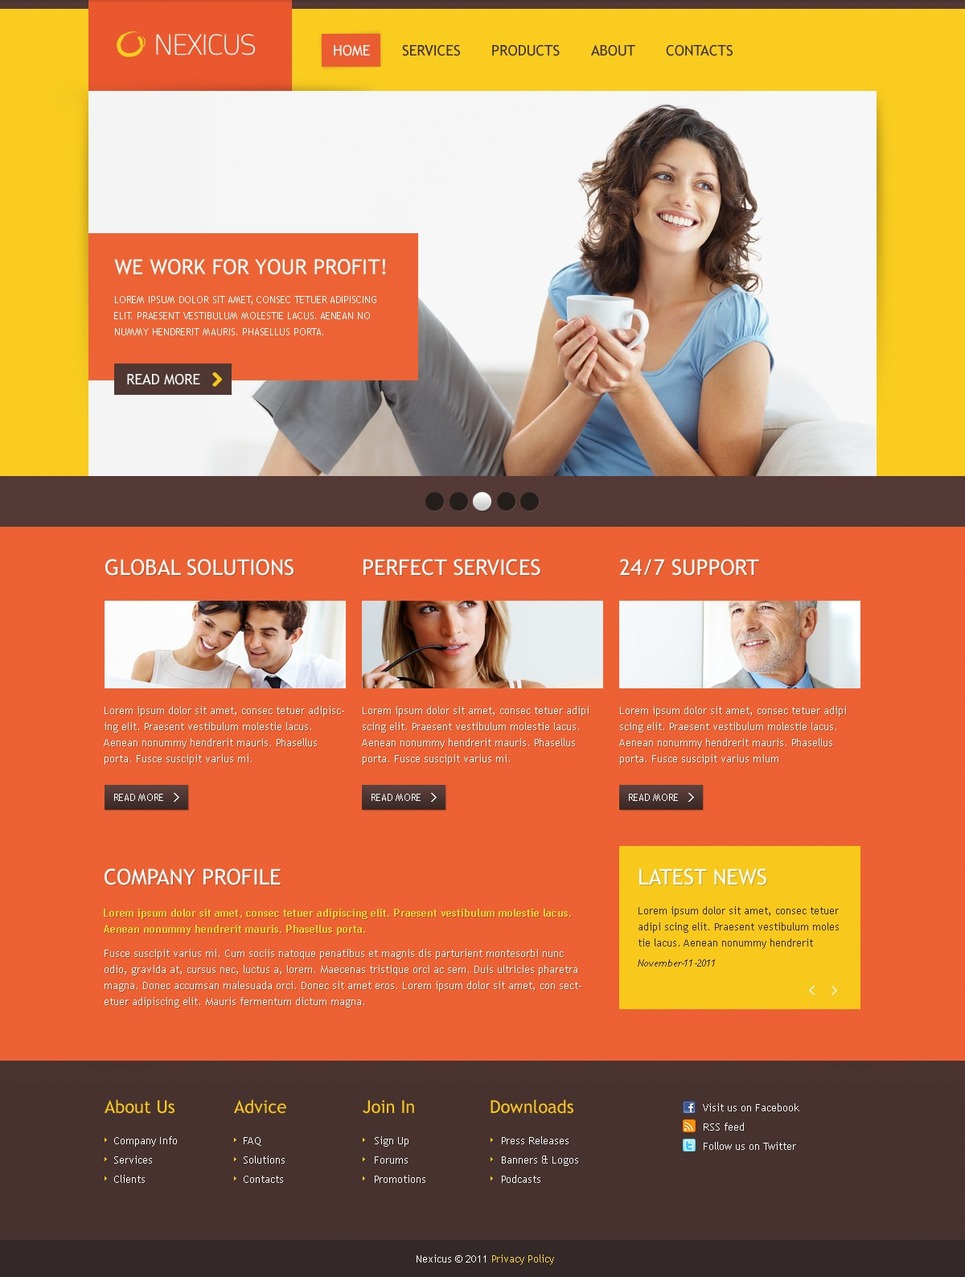 Business Razor Template New Screenshots BIG